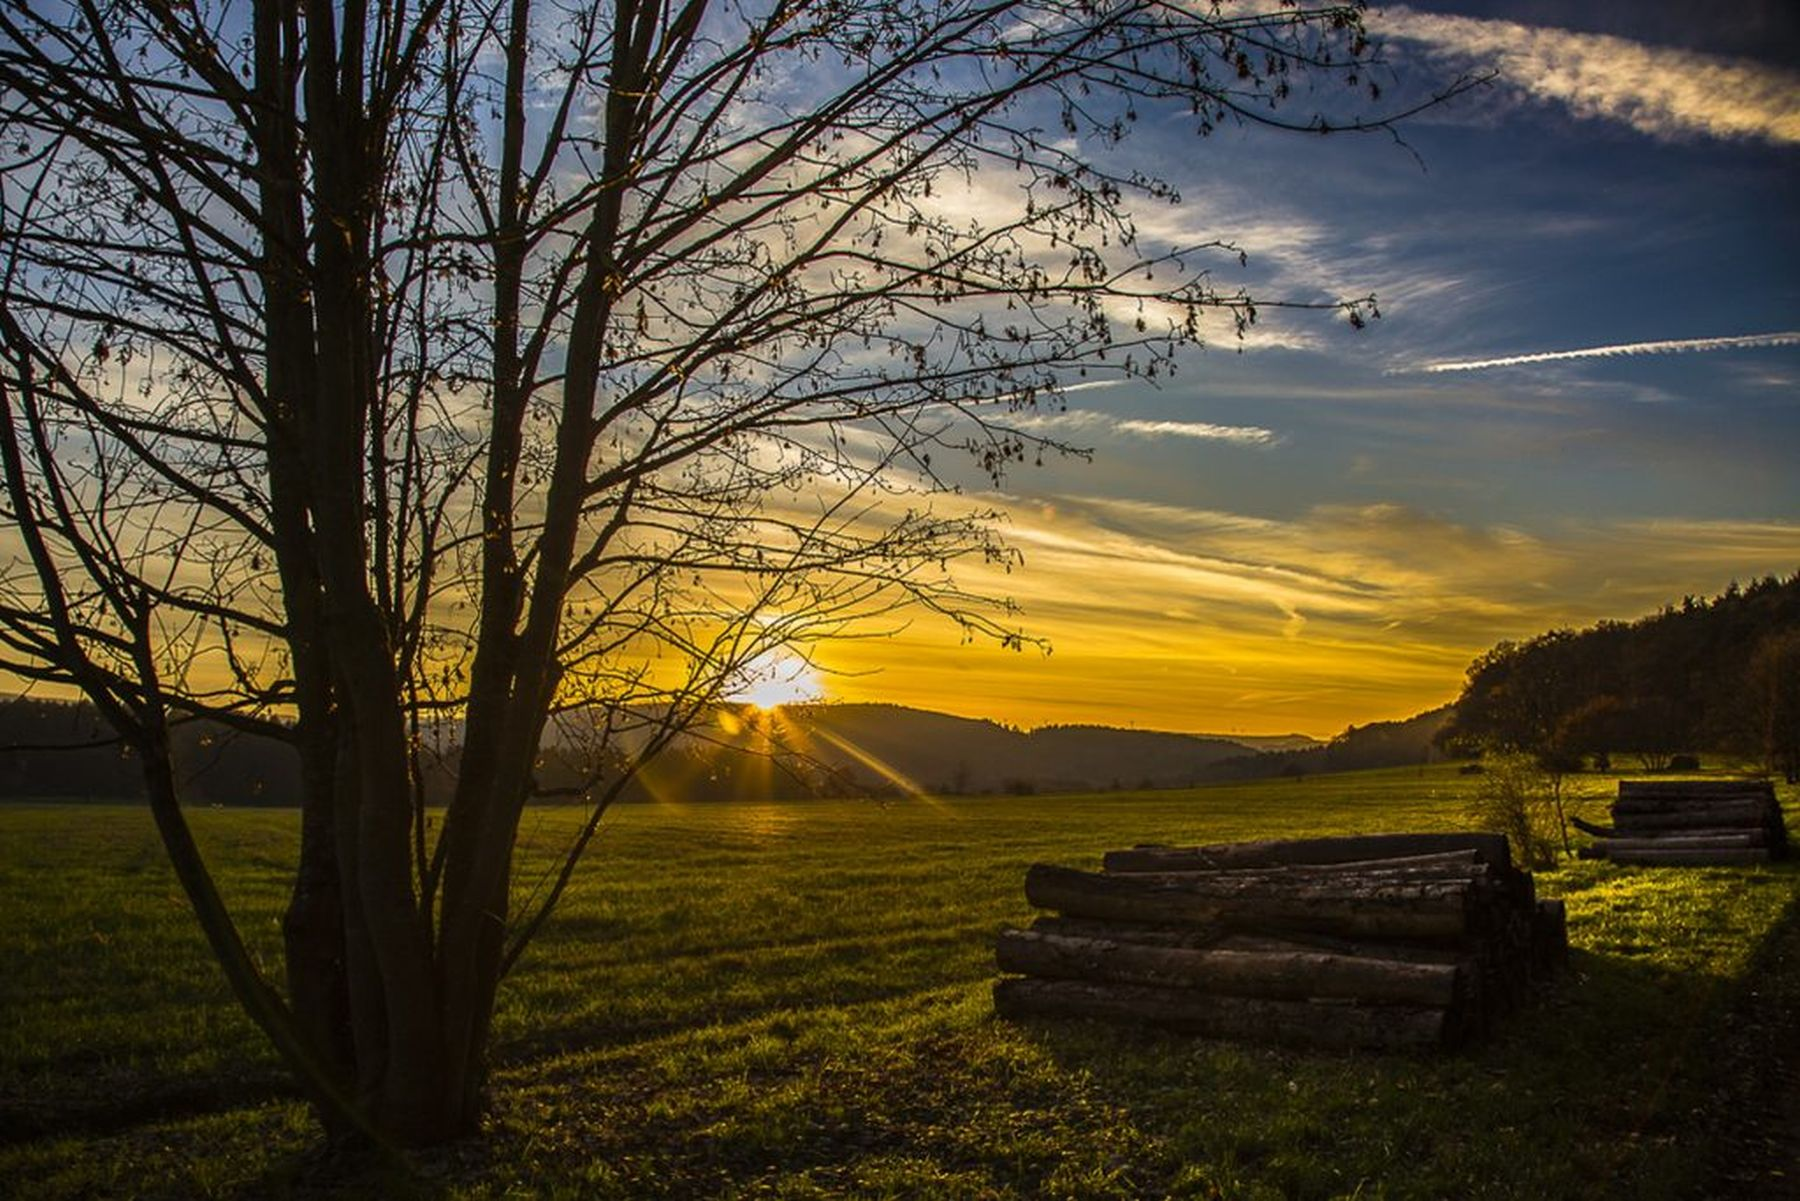 Sonnenuntergang bei Besseringen